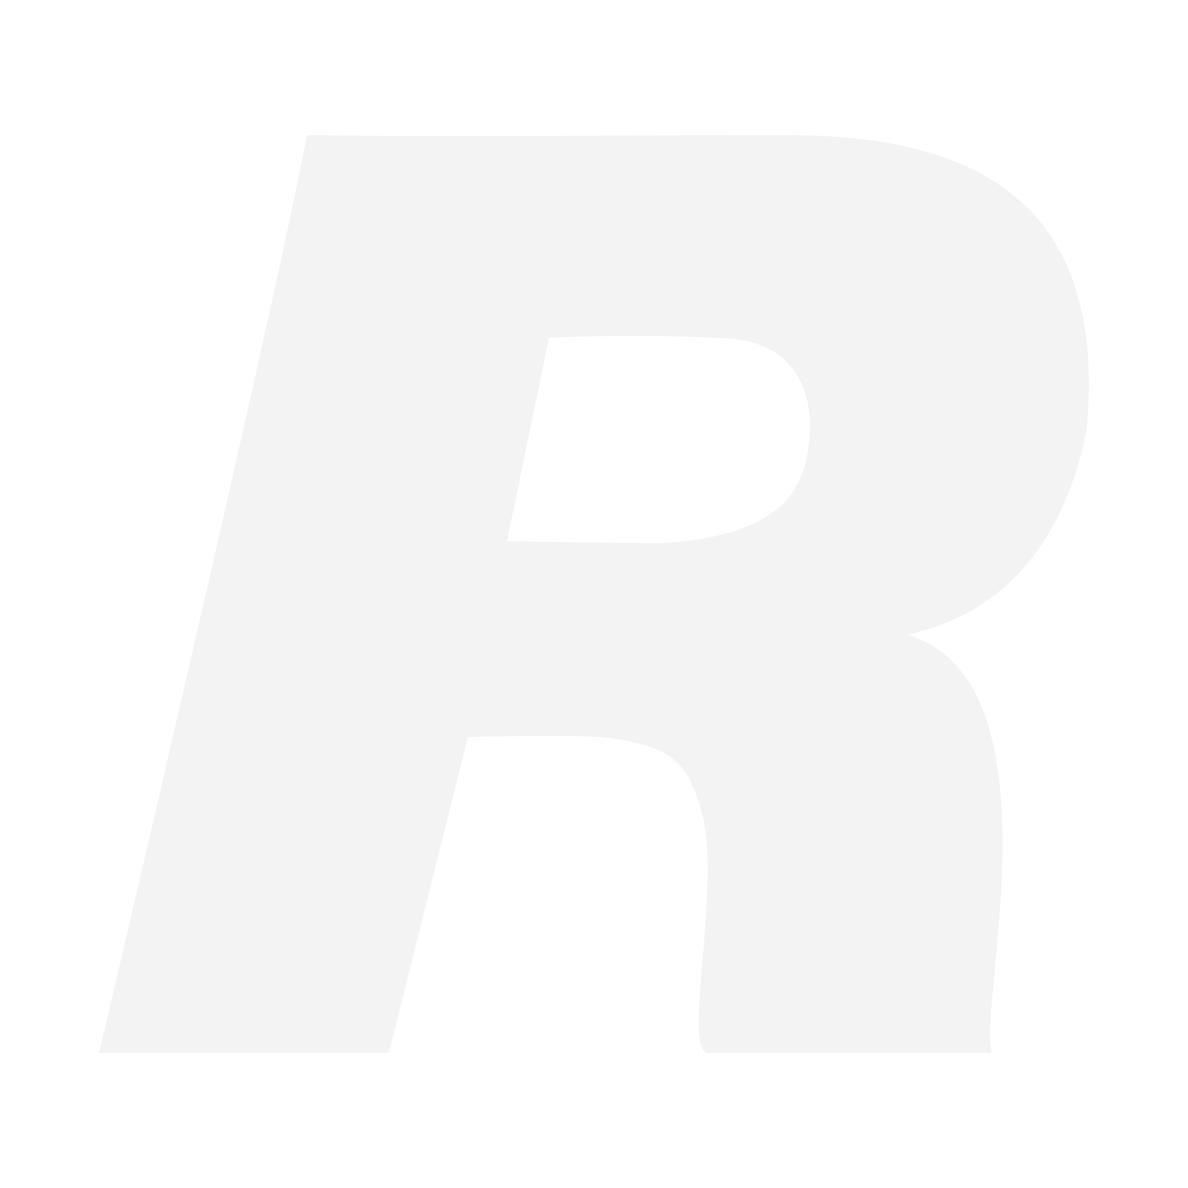 PROFOTO ACUTE/D4 HEAD (SIS. ALV 24%) KÄYTETTY